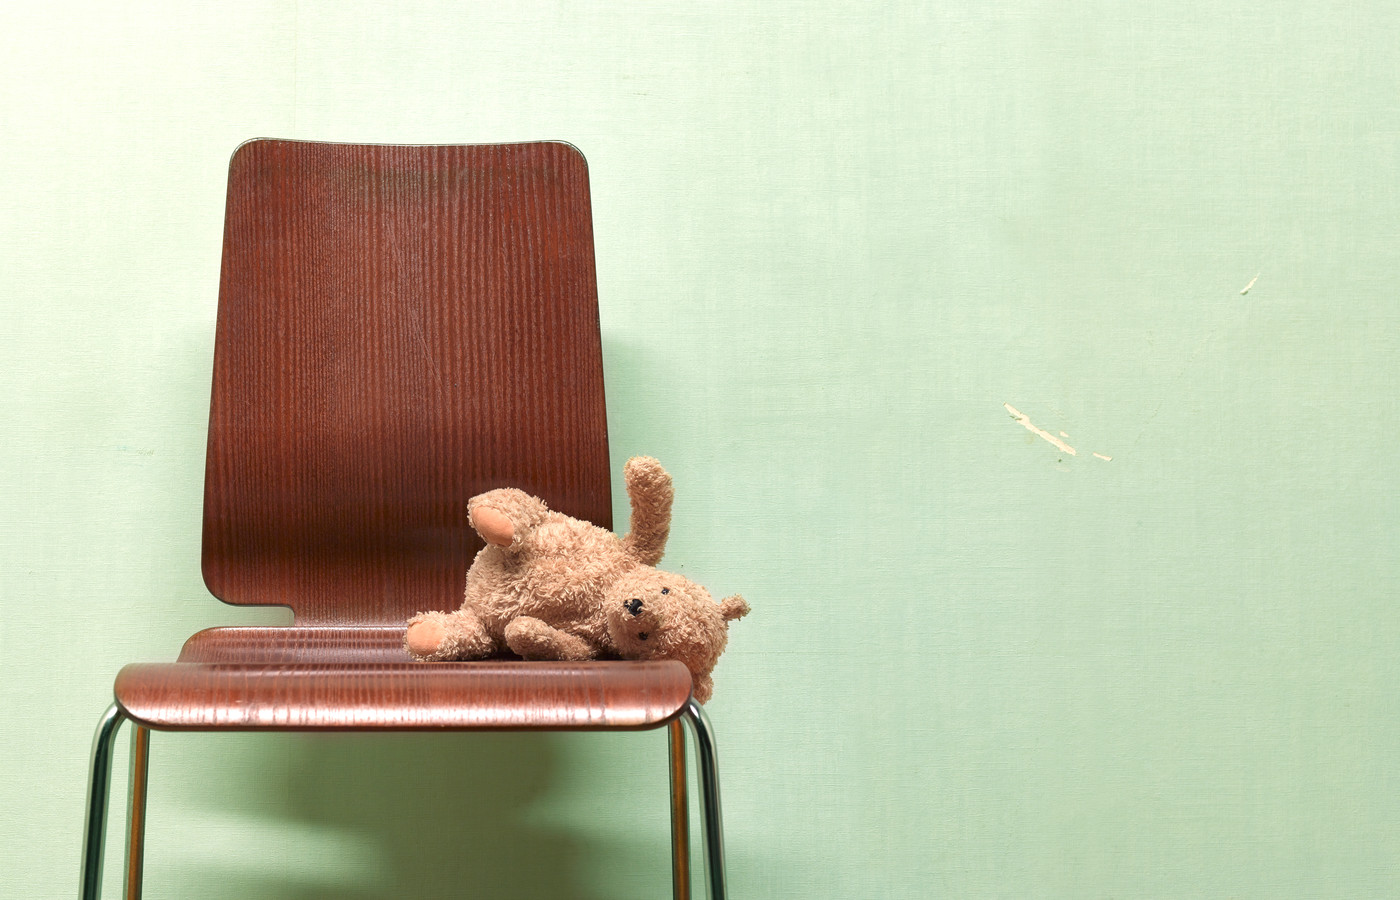 Kindermishandeling, illustratief, beeld: Getty Images